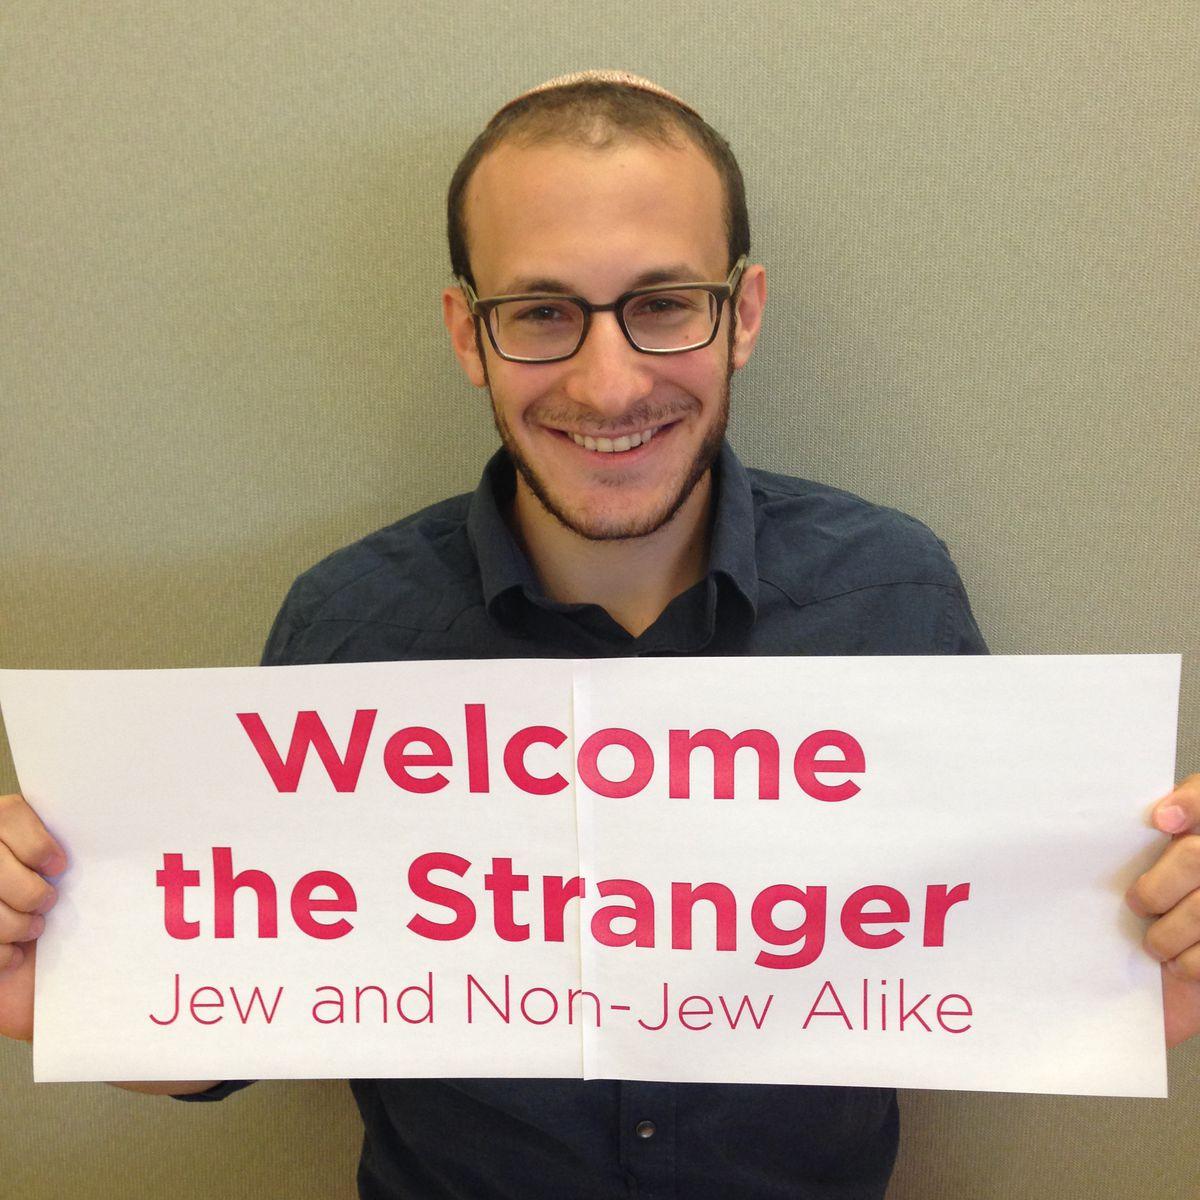 HIAS welcome the stranger